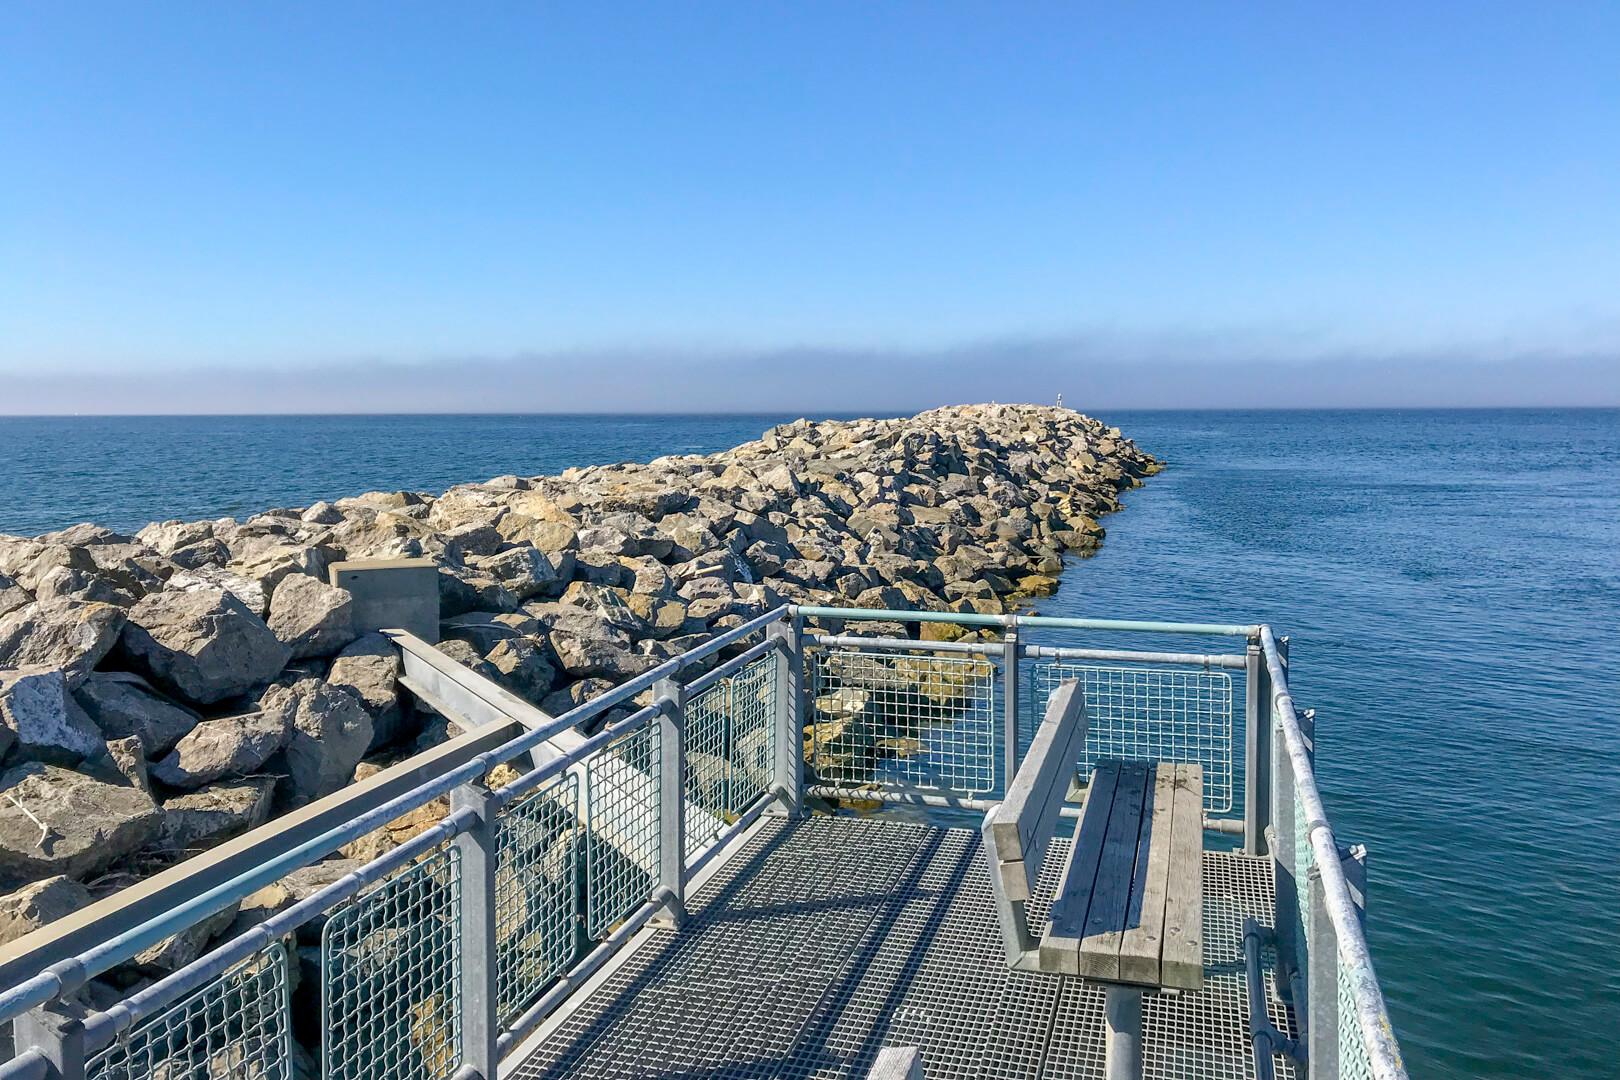 Jetée Matane quai vieux port